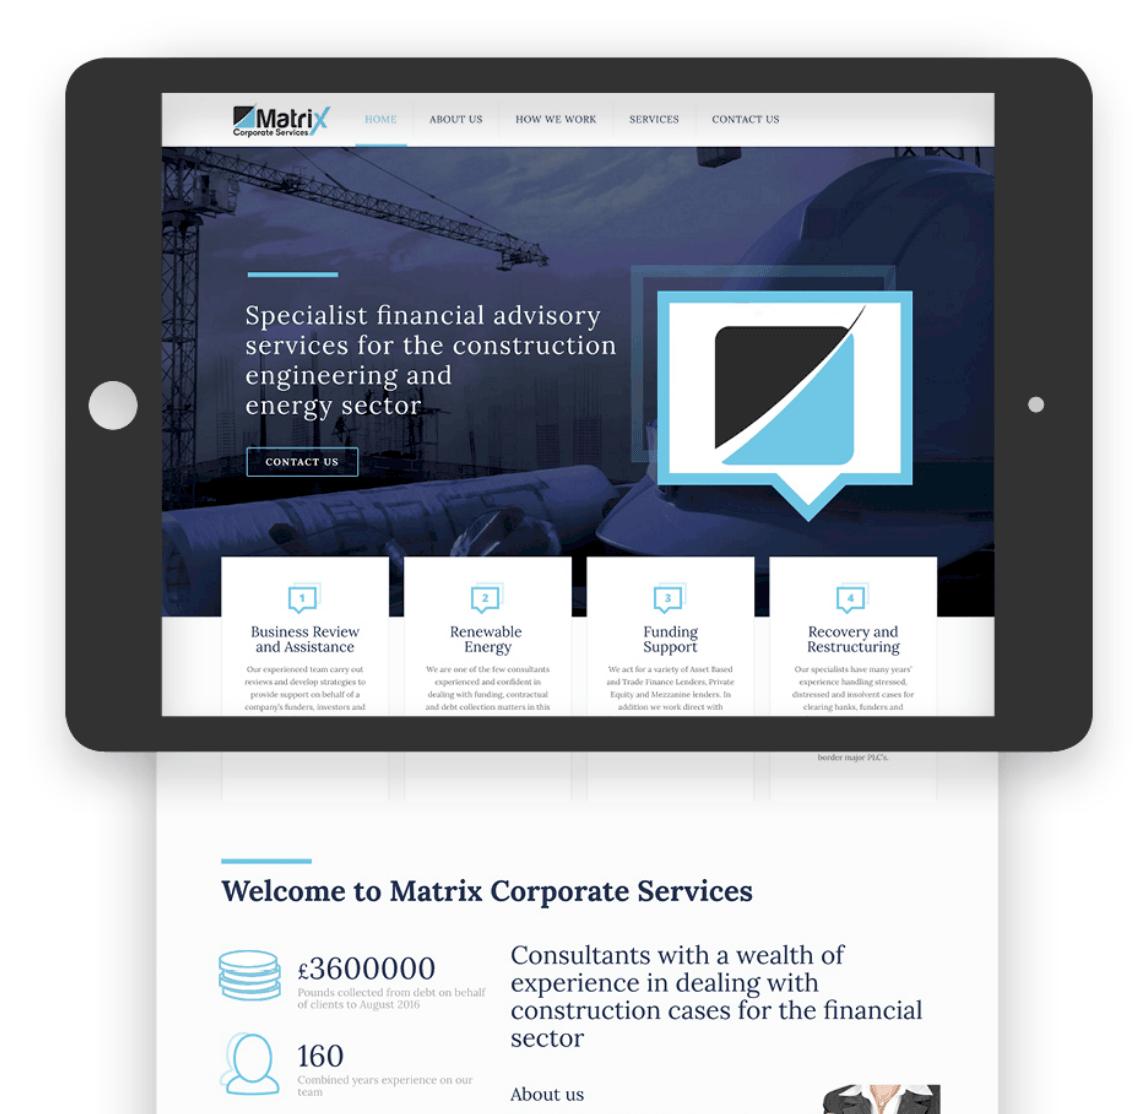 Matrix Corporate Services home page